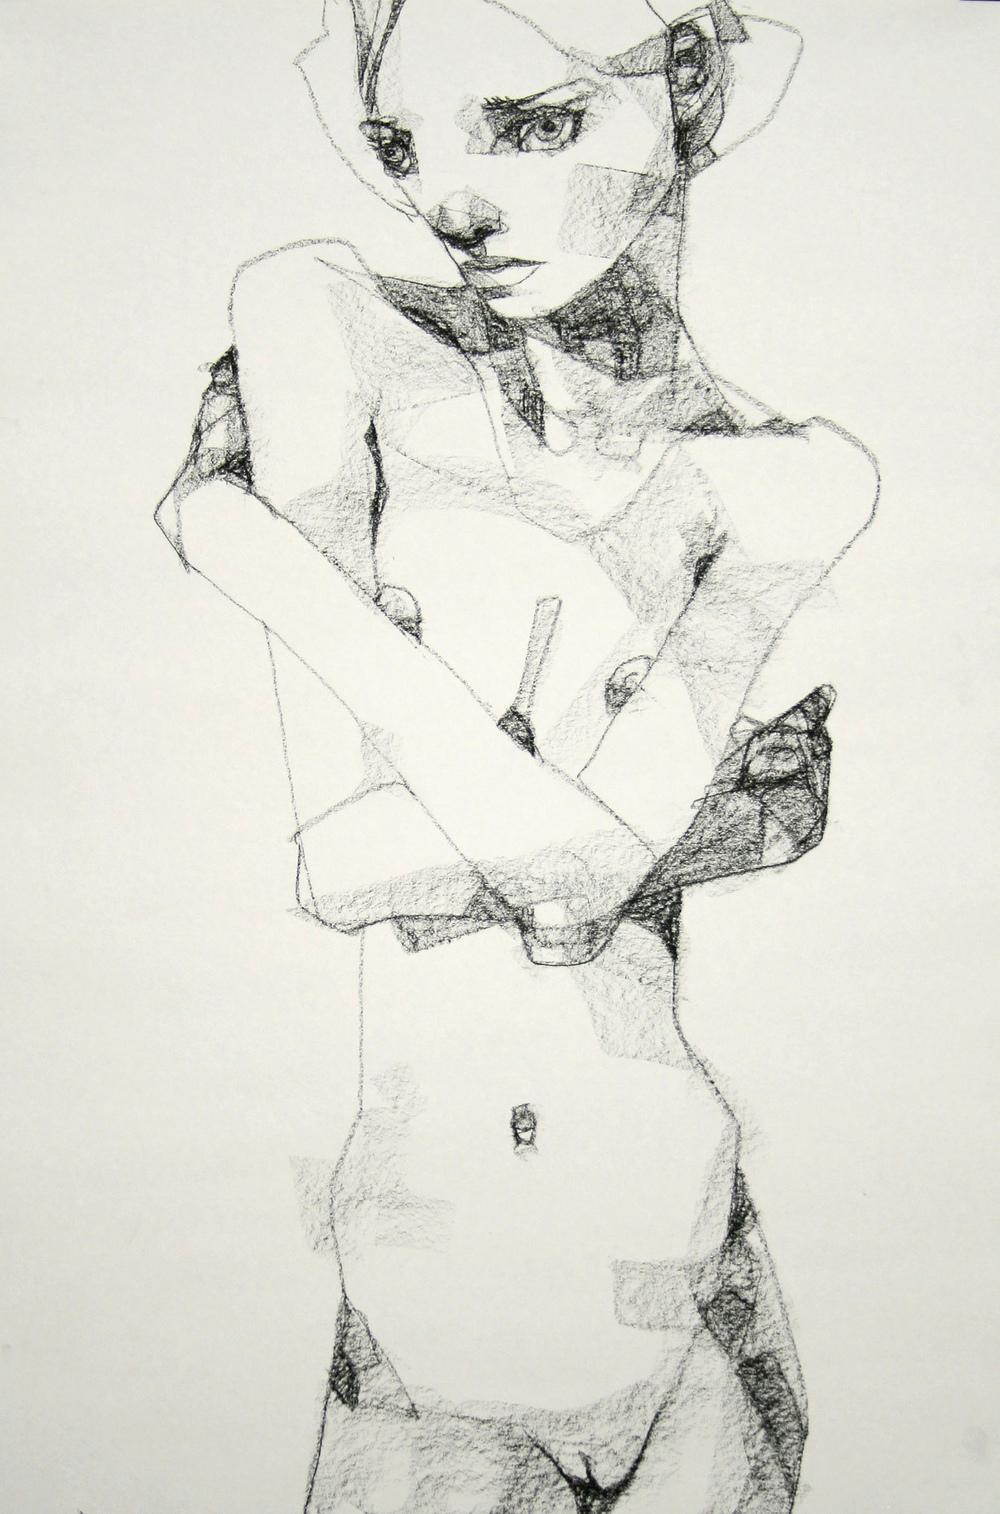 the-tree-mag-drawings-by-lu-cong-130.jpg